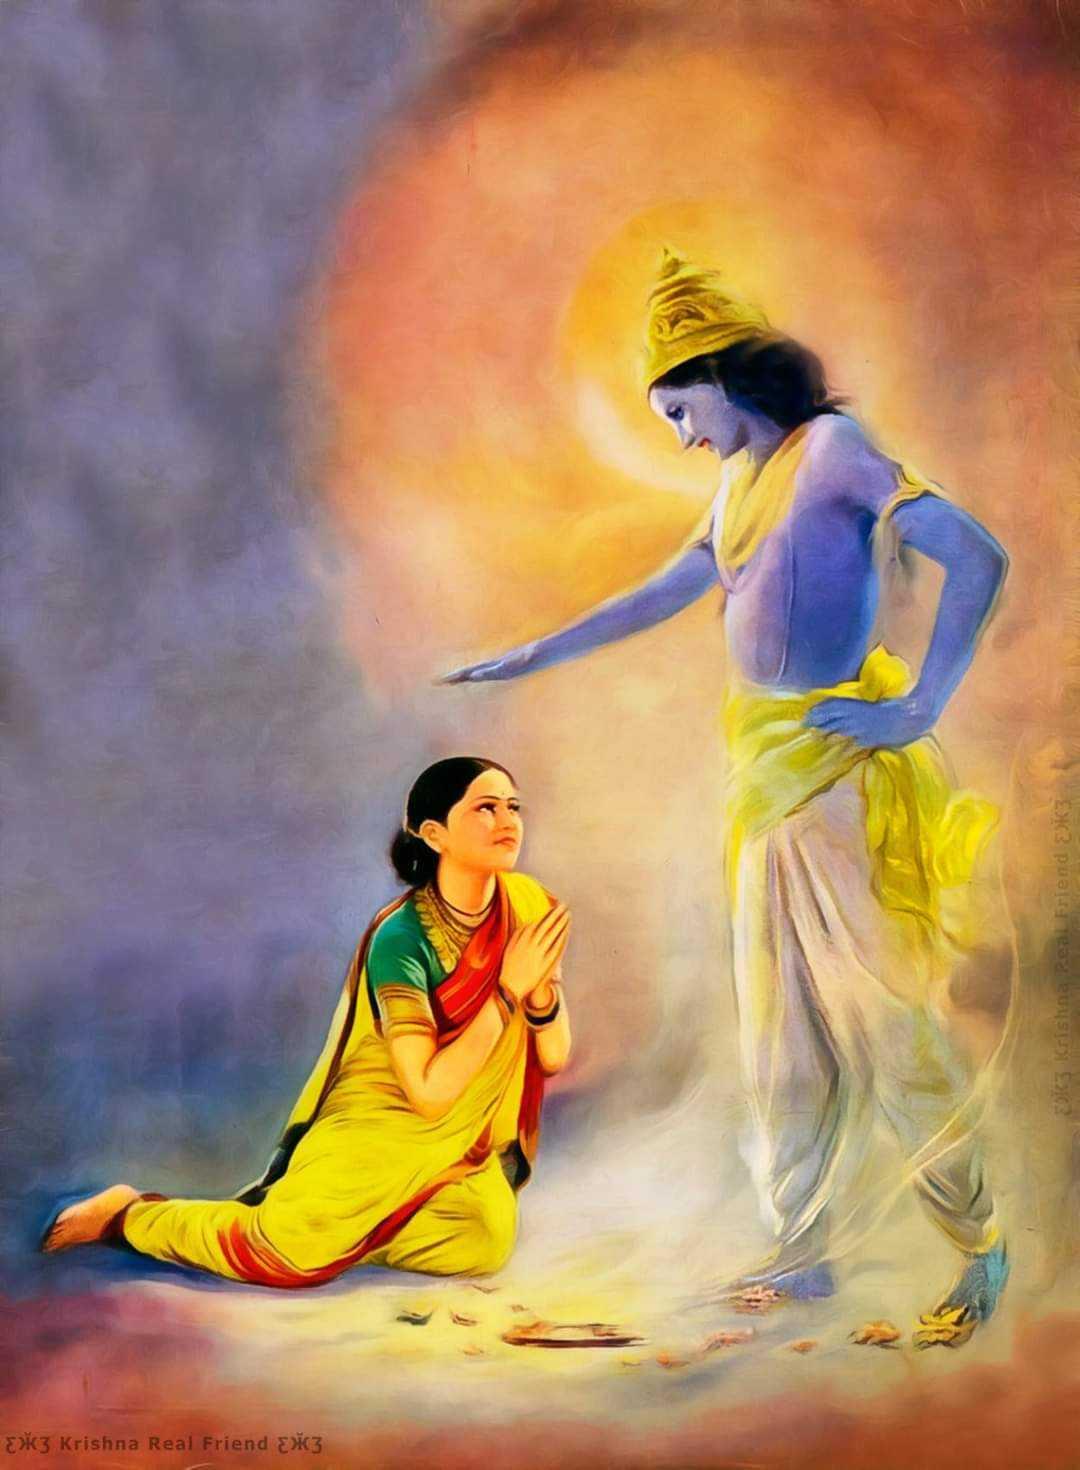 Radha Krishna love story is eternal and sublime - Radha Krishna love story is eternal and sublime